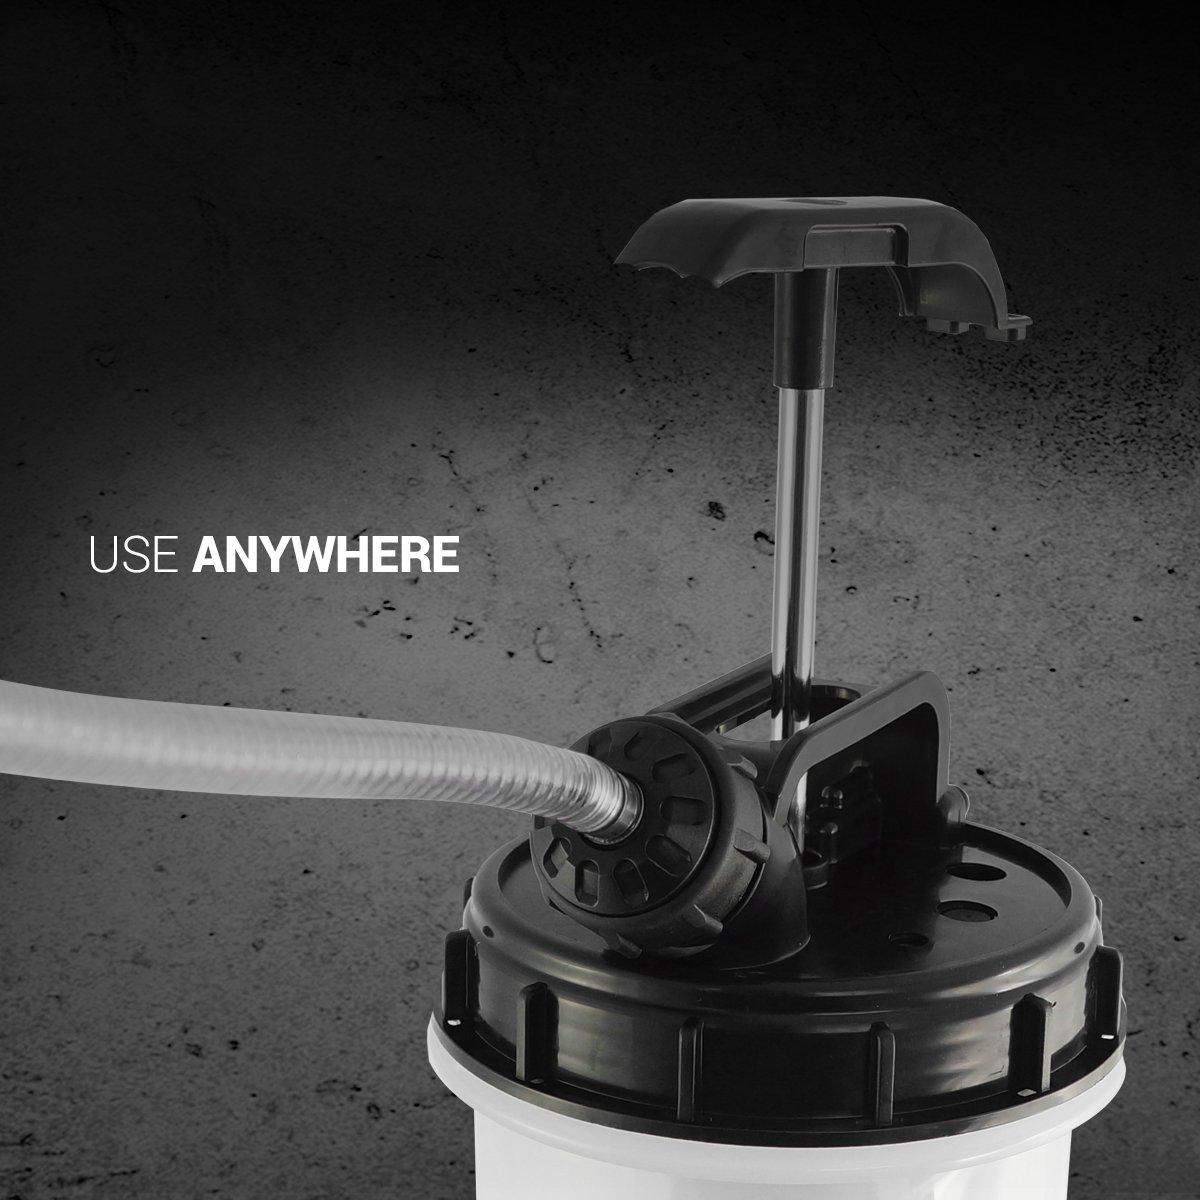 EWK 7.5 Liter Manual Oil Pump Extractor Fluid Evacuator For DIY Oil Change by EWK (Image #2)